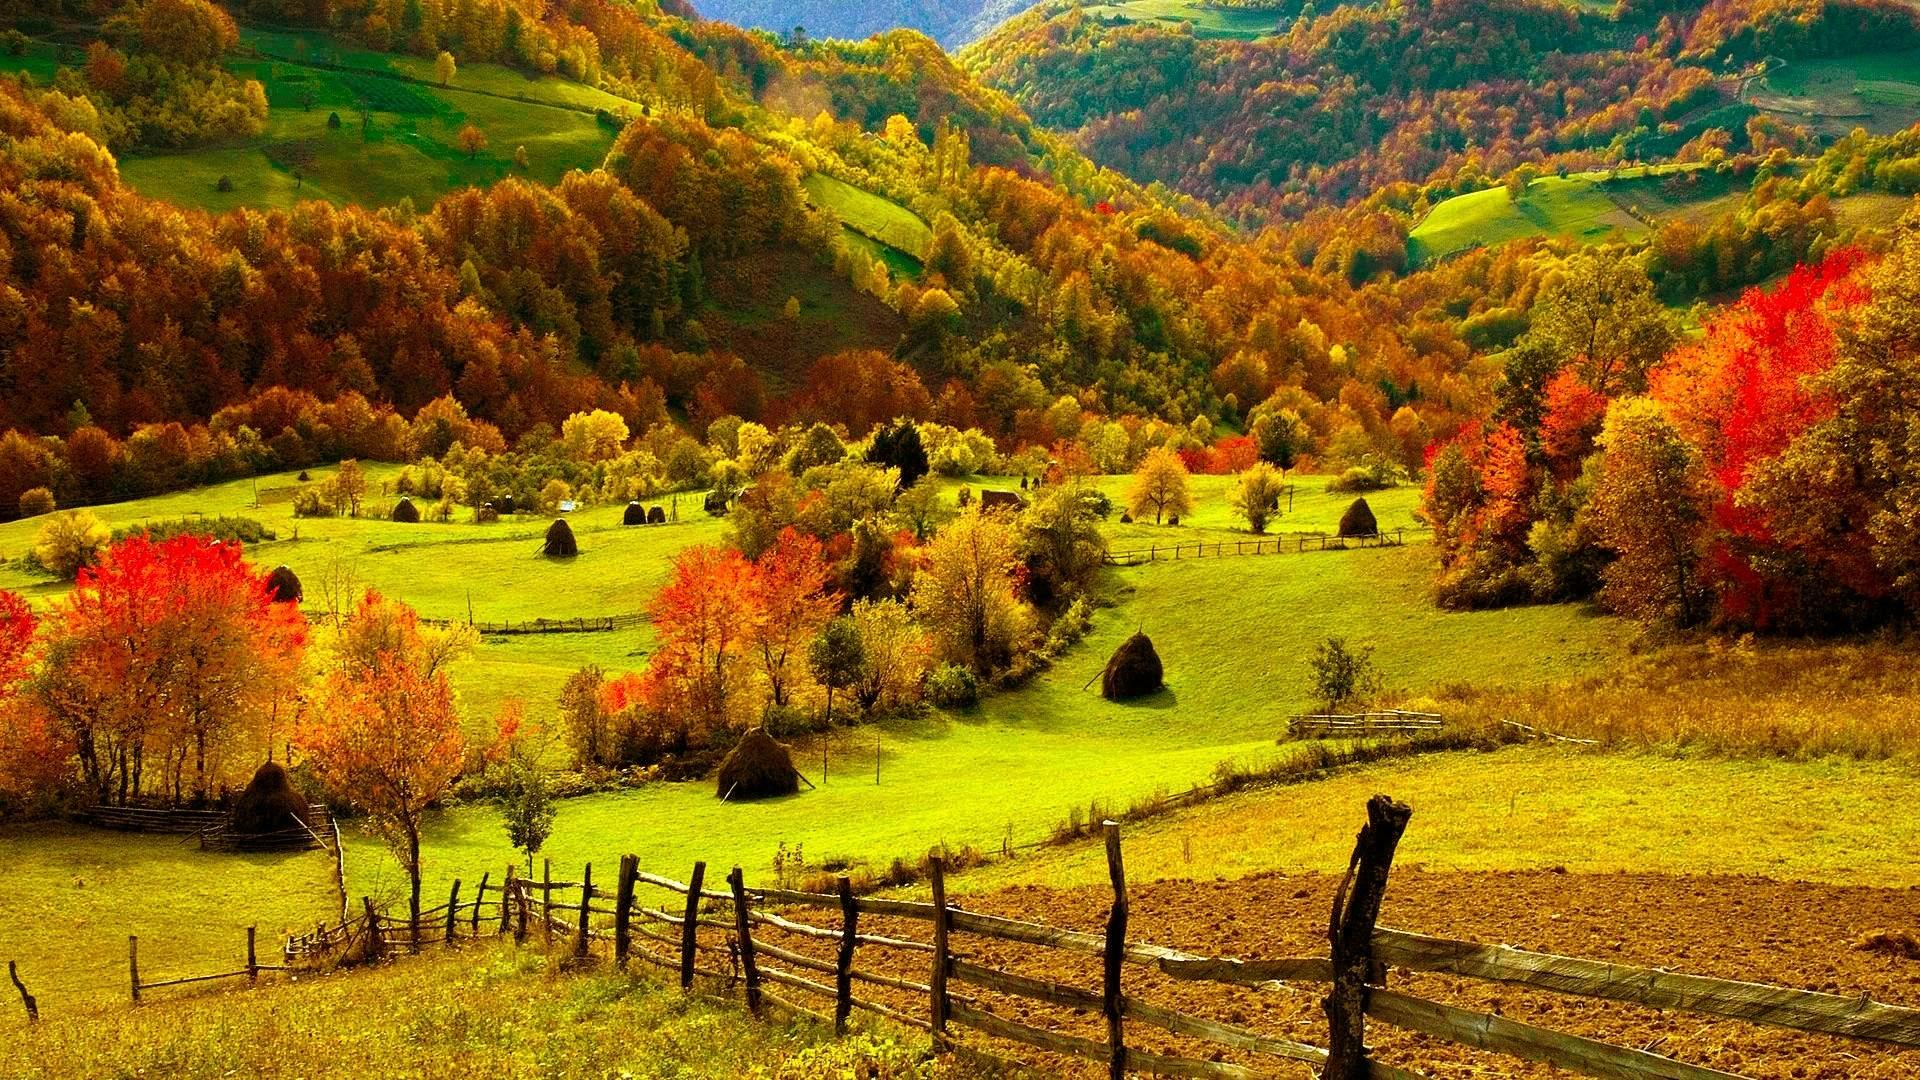 free autumn wallpaper backgrounds - HD Desktop Wallpapers ...